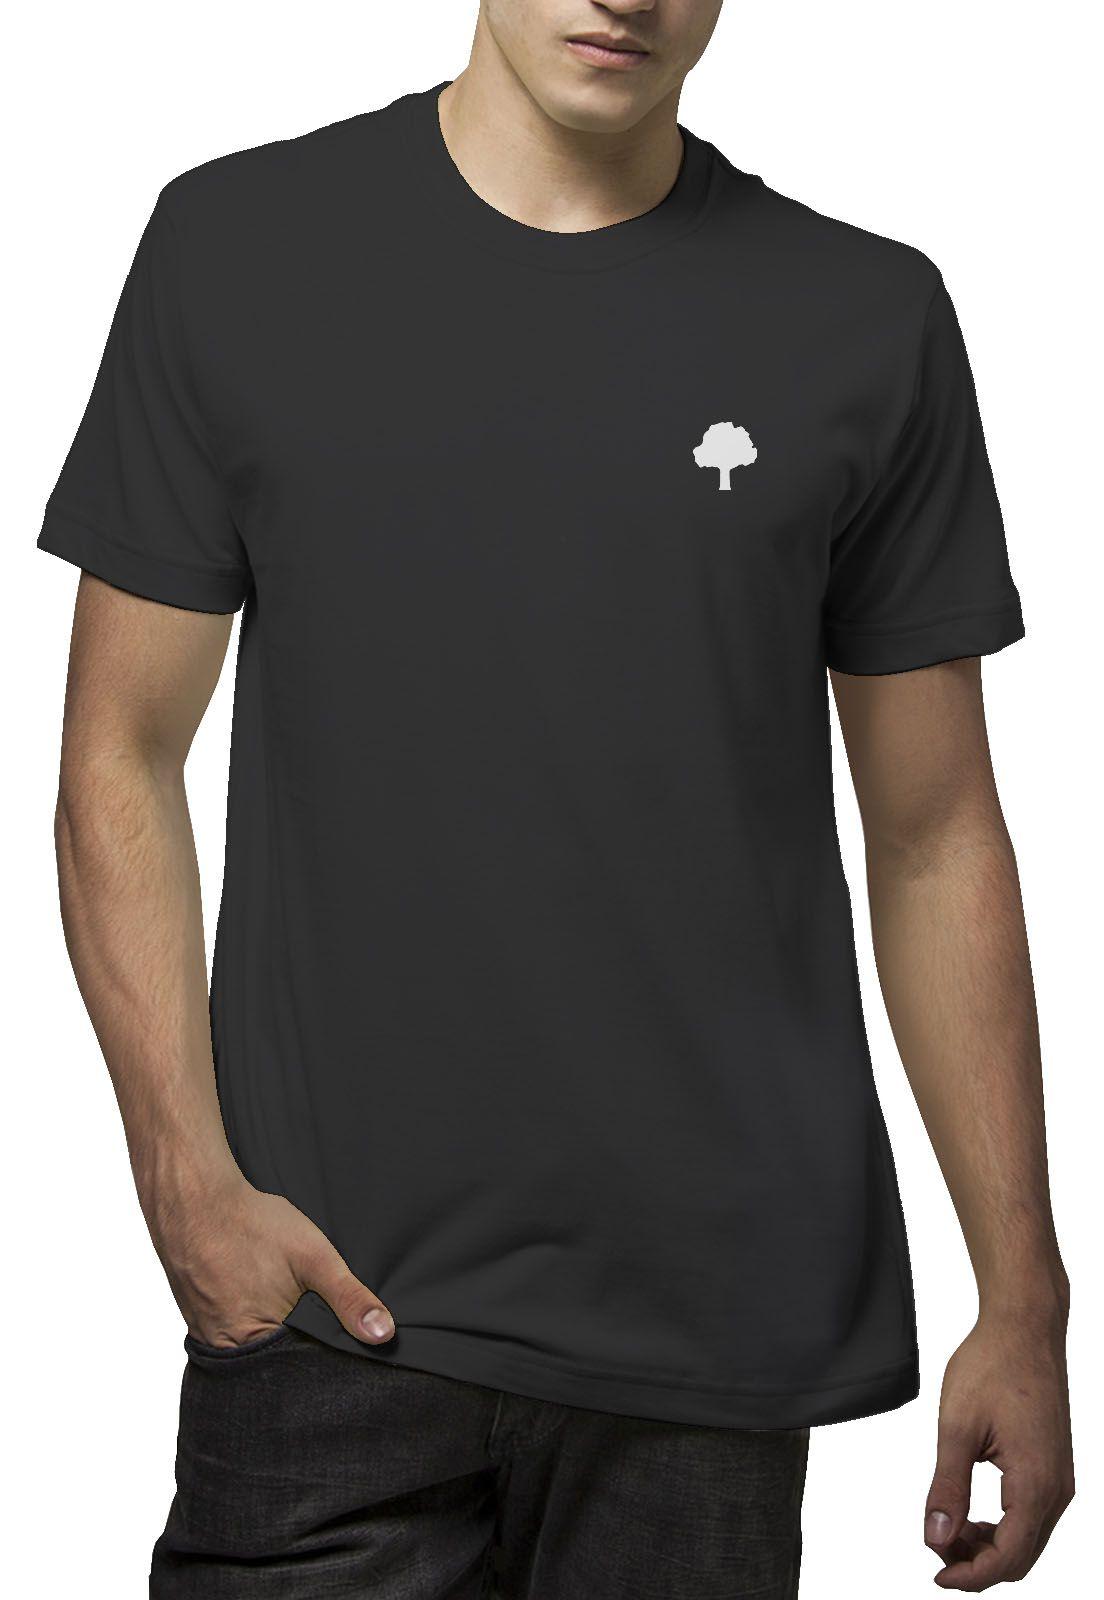 Camiseta Amazônia Psicodelic - Preto